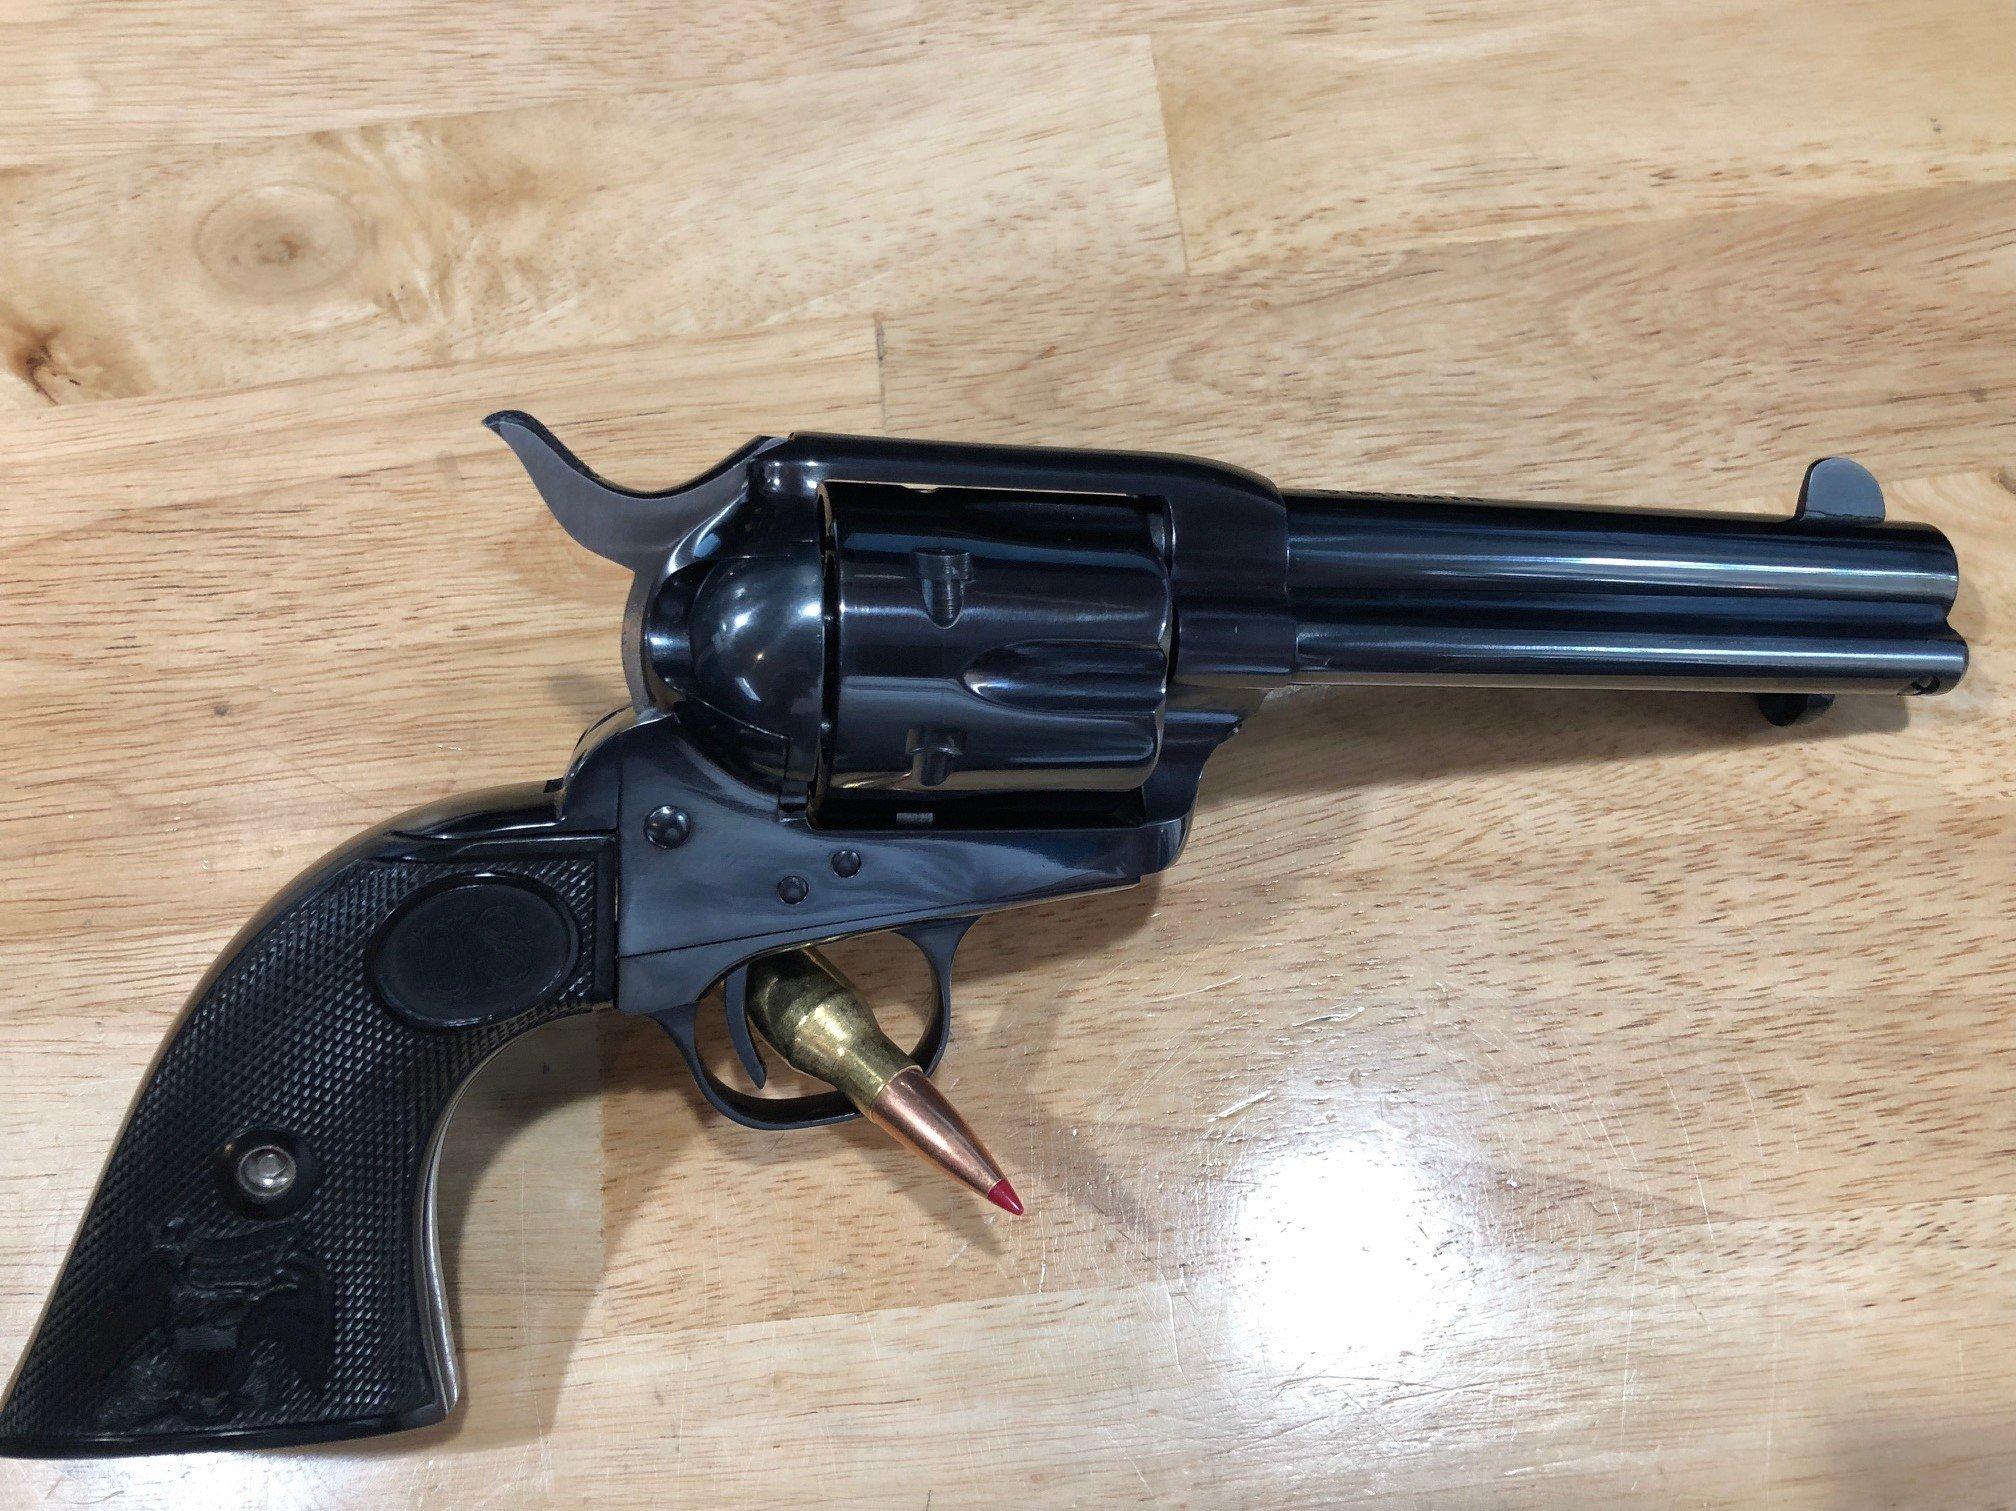 WTB - USFA 1873 45 Colt - SASS Wire Classifieds - SASS Wire